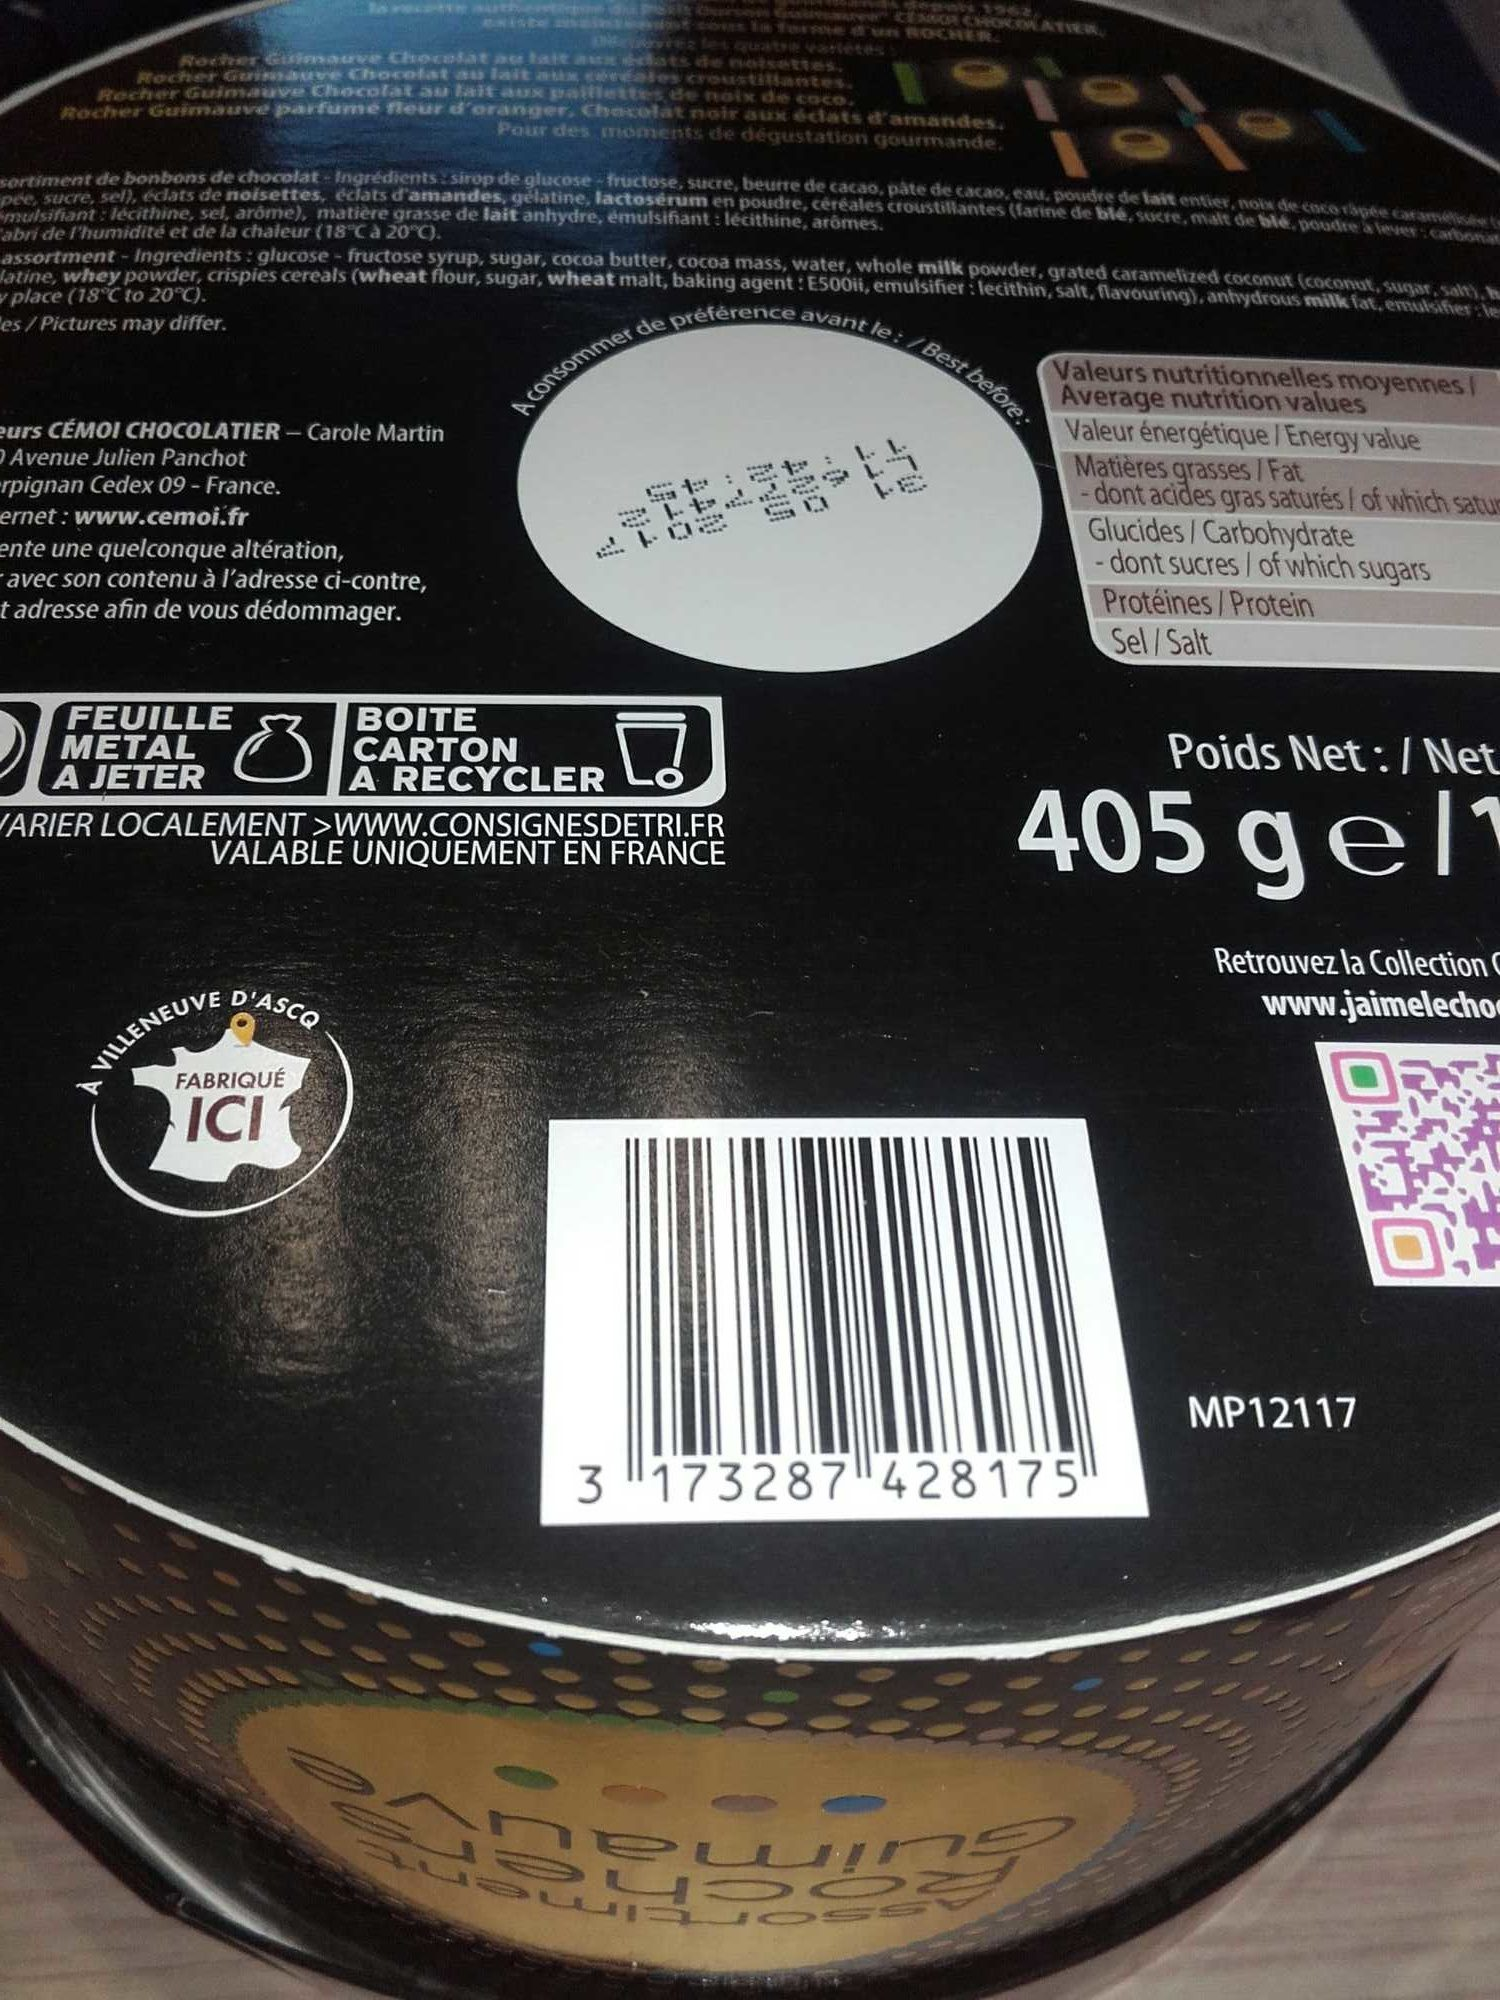 Assortiment Rochers Guimauves - Product - fr